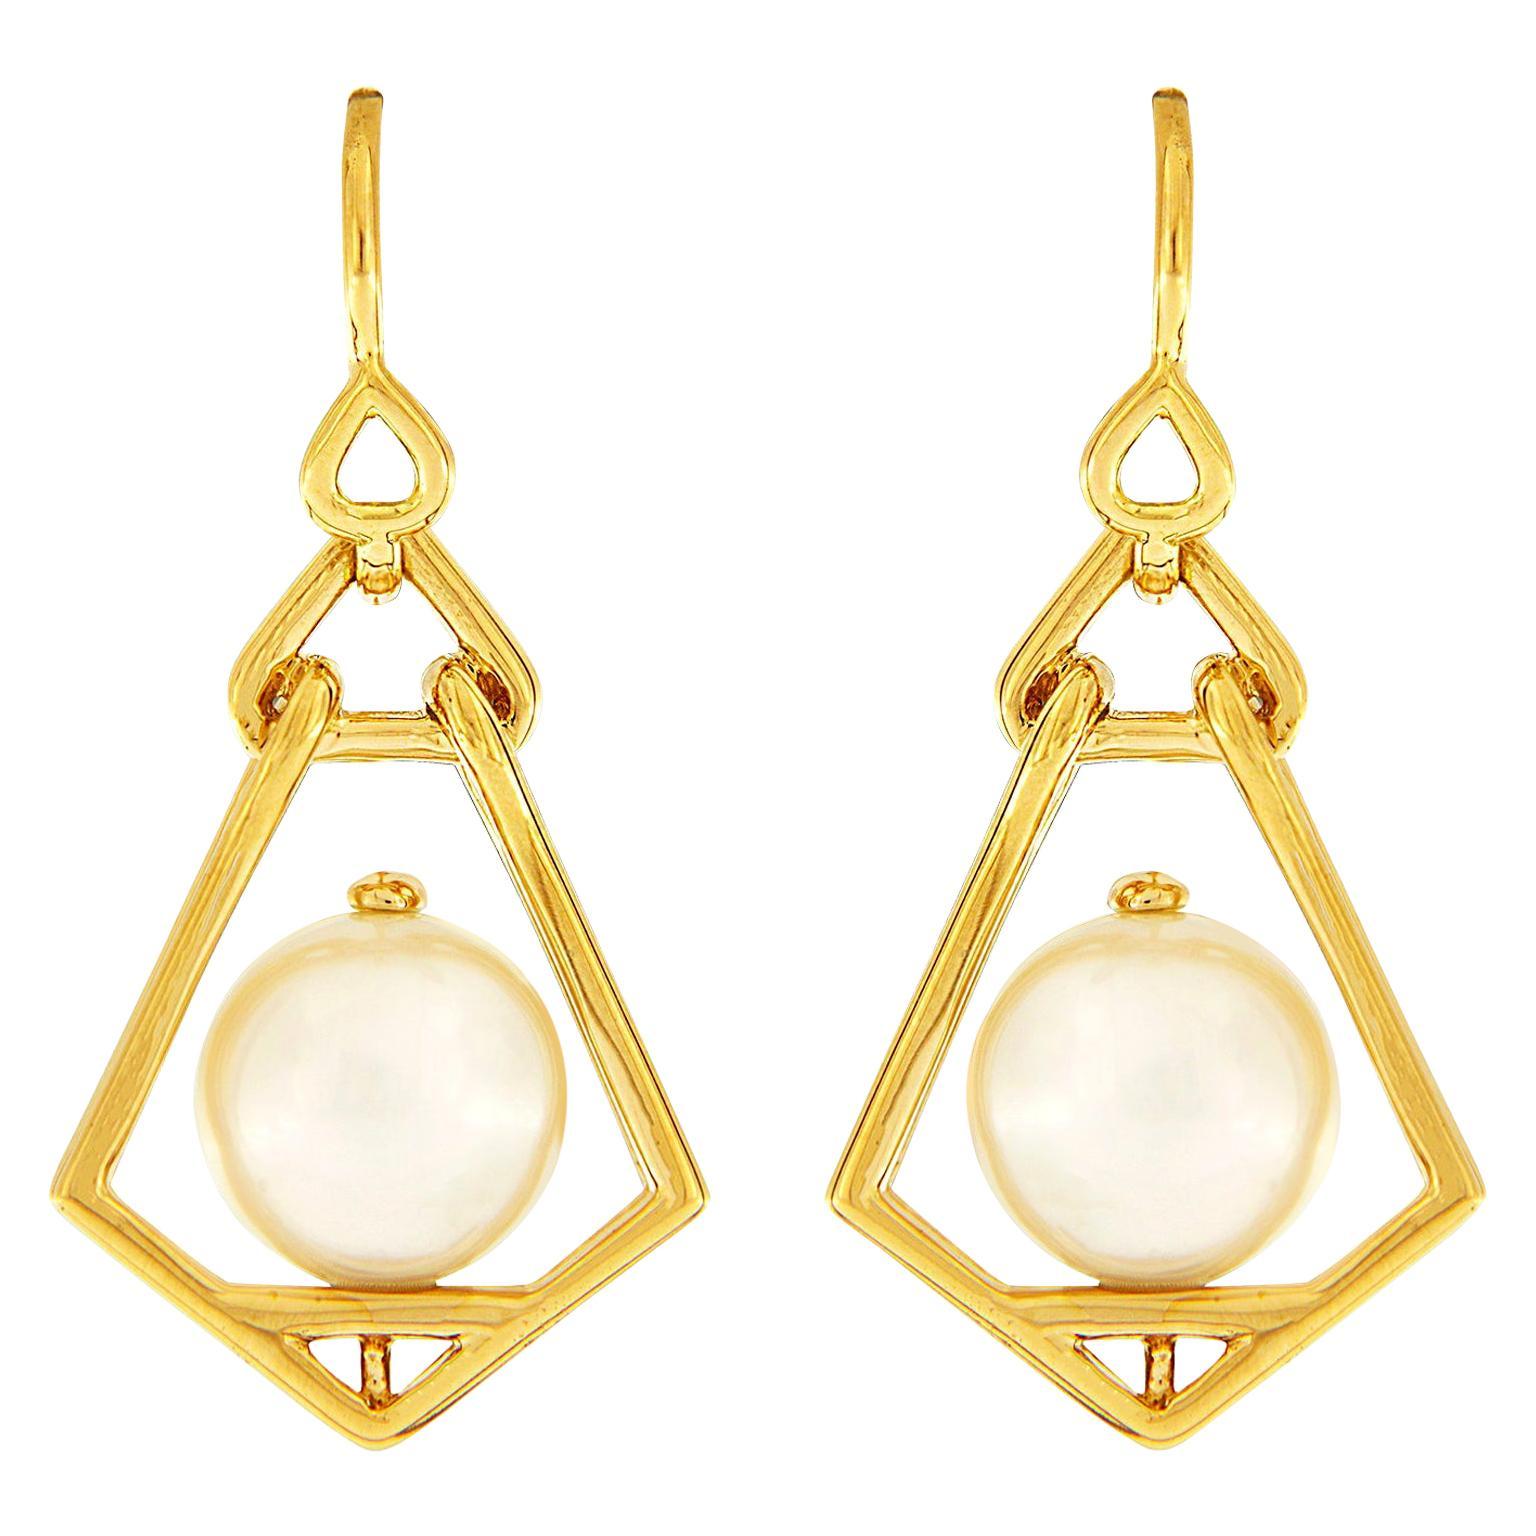 Valentin Magro Geometric Lantern Large Pearl Earrings